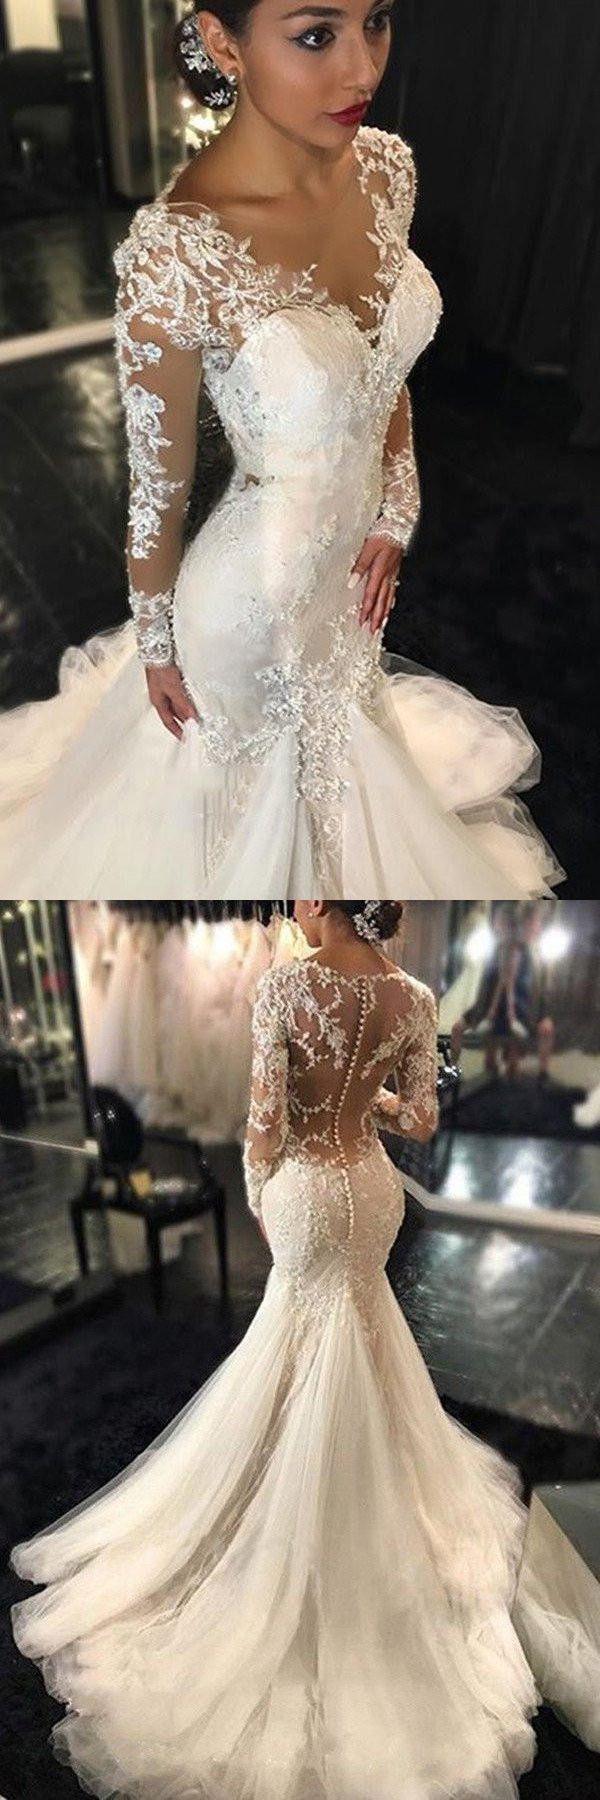 Mermaid dress wedding  Long Sleeve Lace Mermaid Wedding Dresses Sexy See Through Long